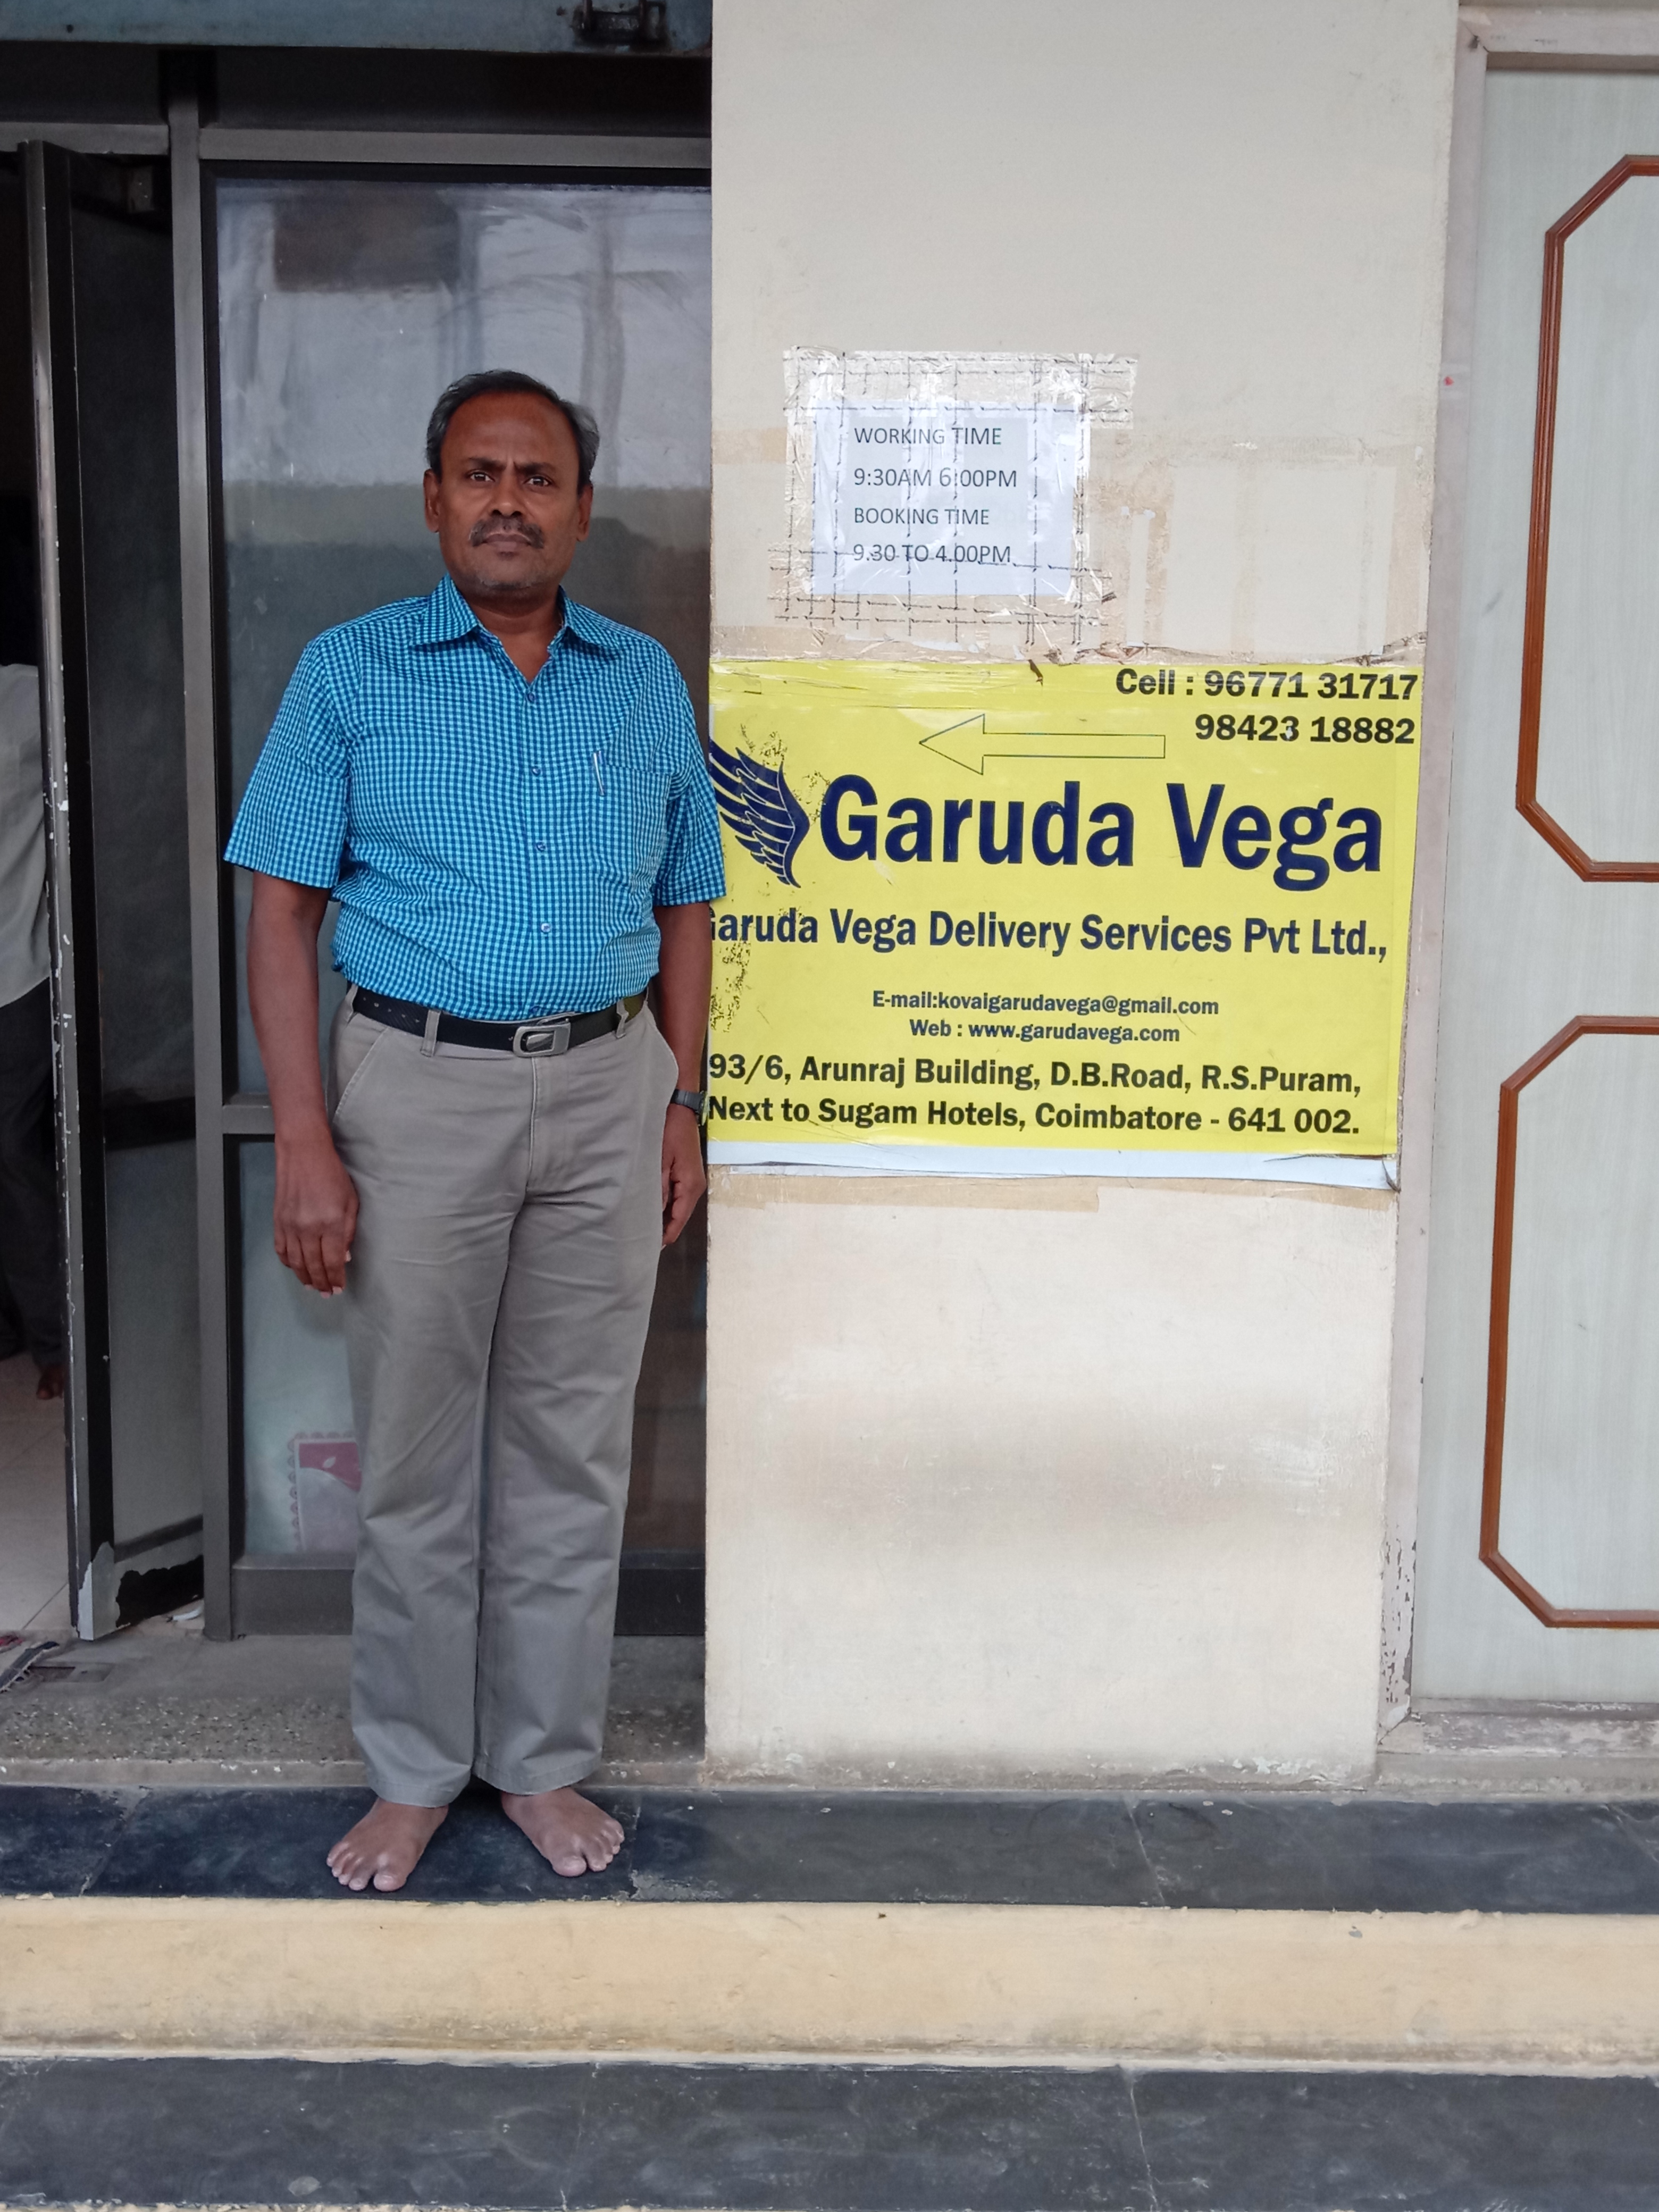 Garudavega Courier Services - Worldwide